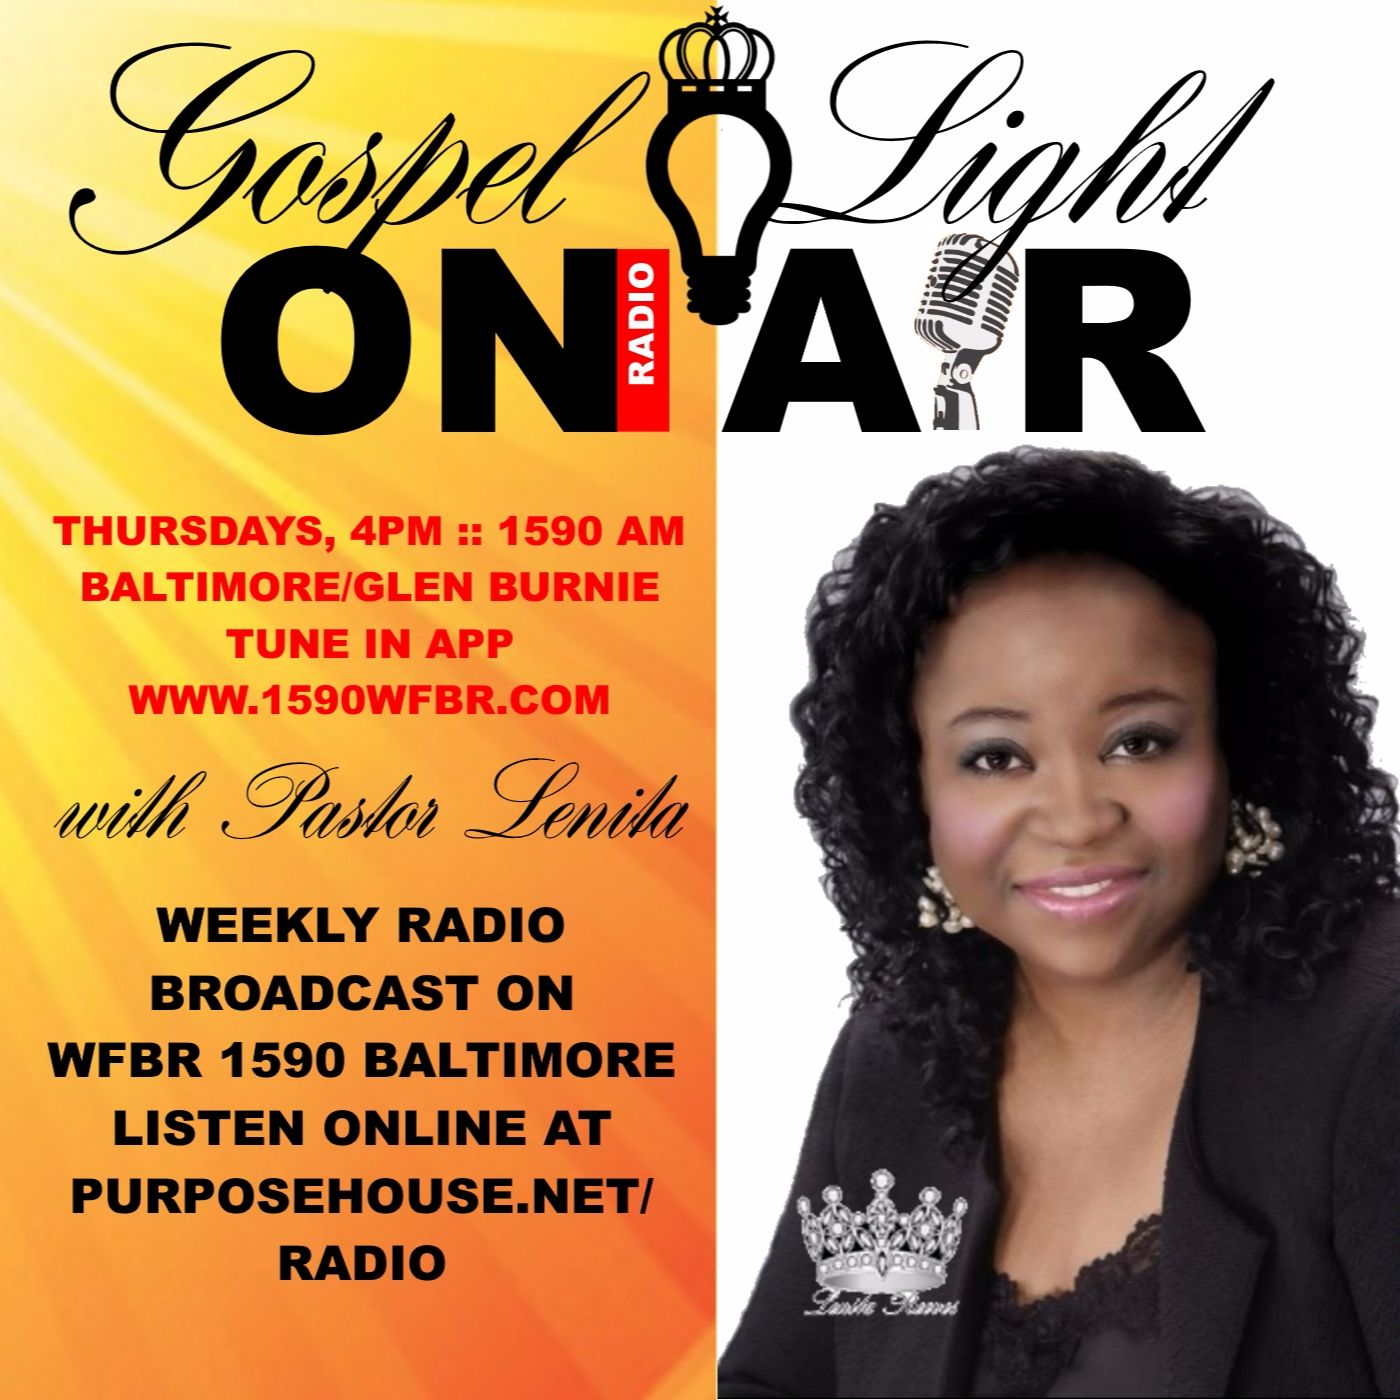 Gospel Light Radio with Pastor Lenita